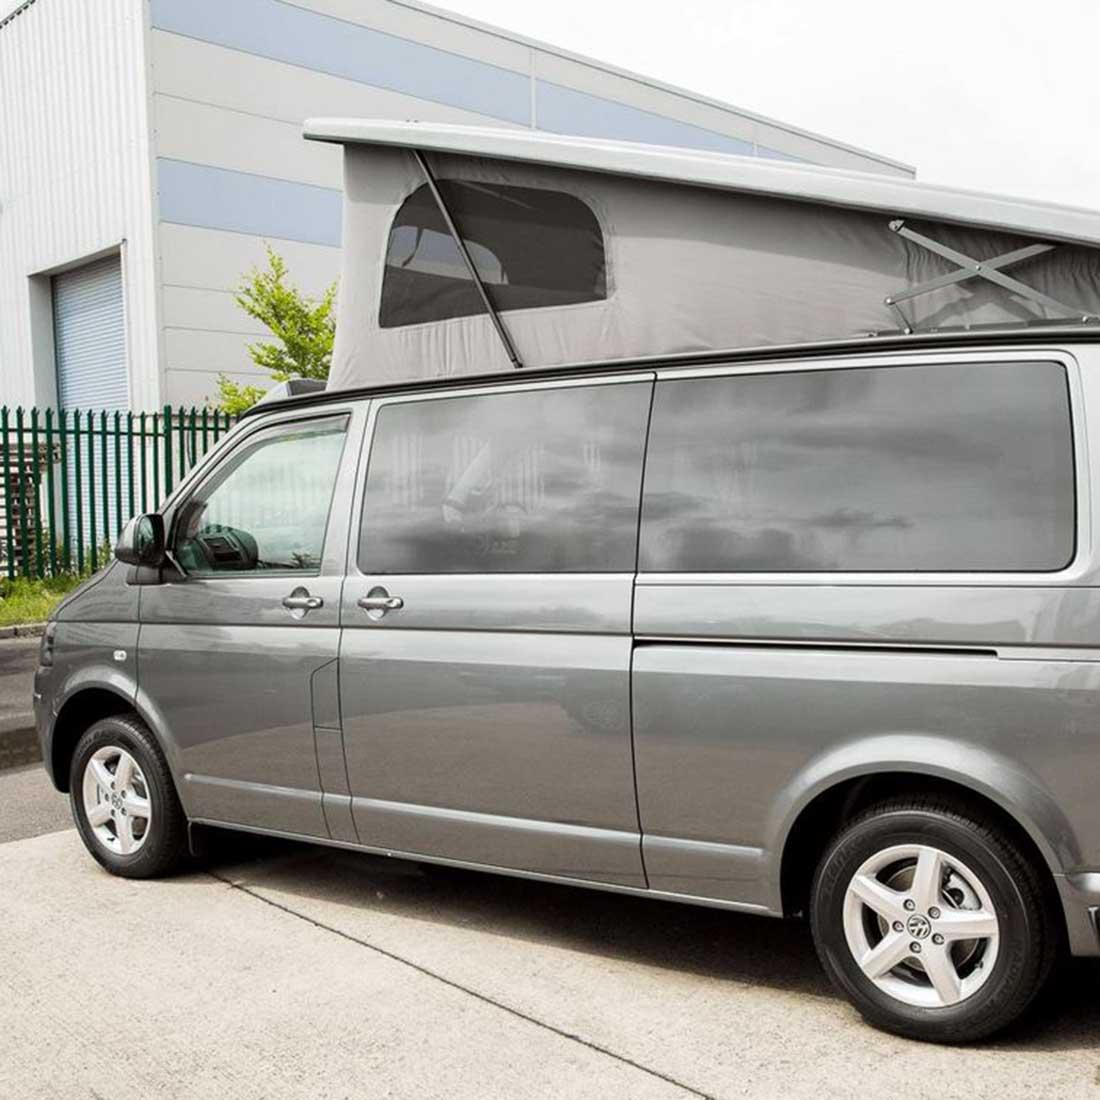 Best campervan conversion parts for sale.